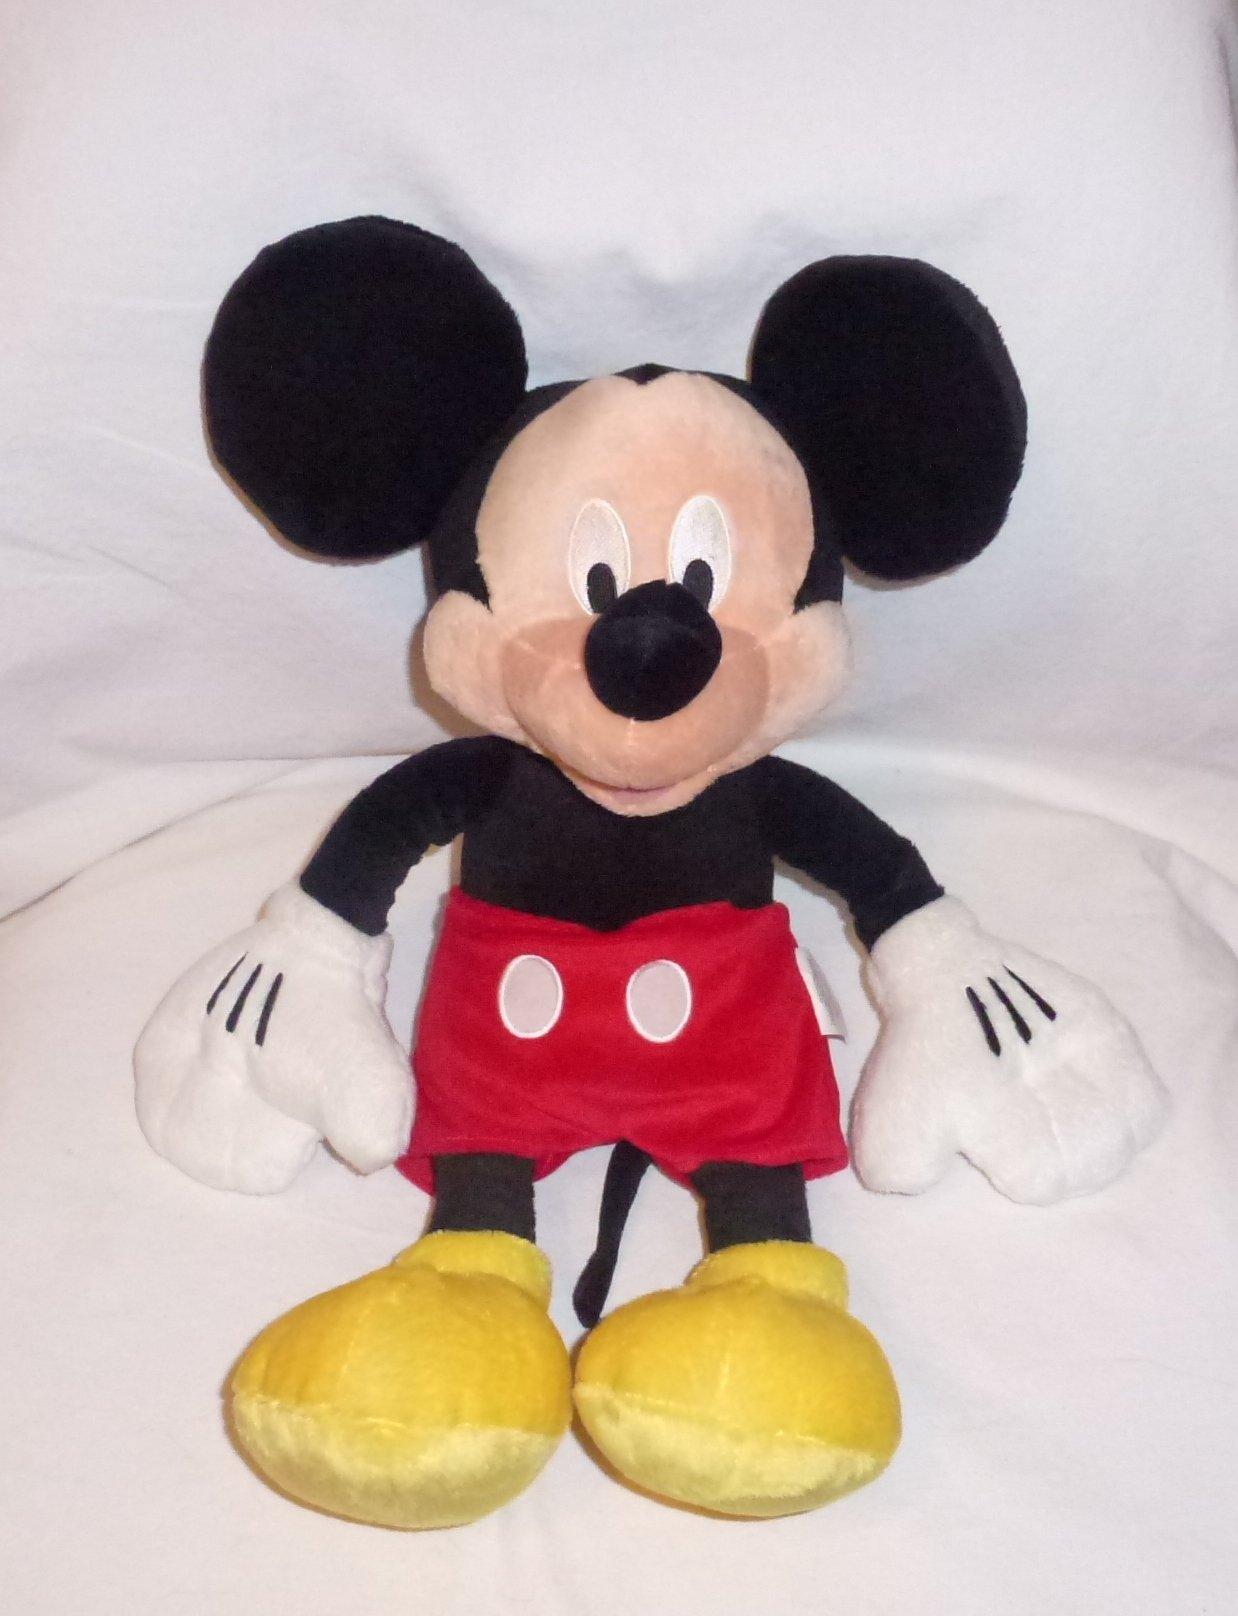 Large Mickey Mouse Plush (Walt Disney World Exclusive)